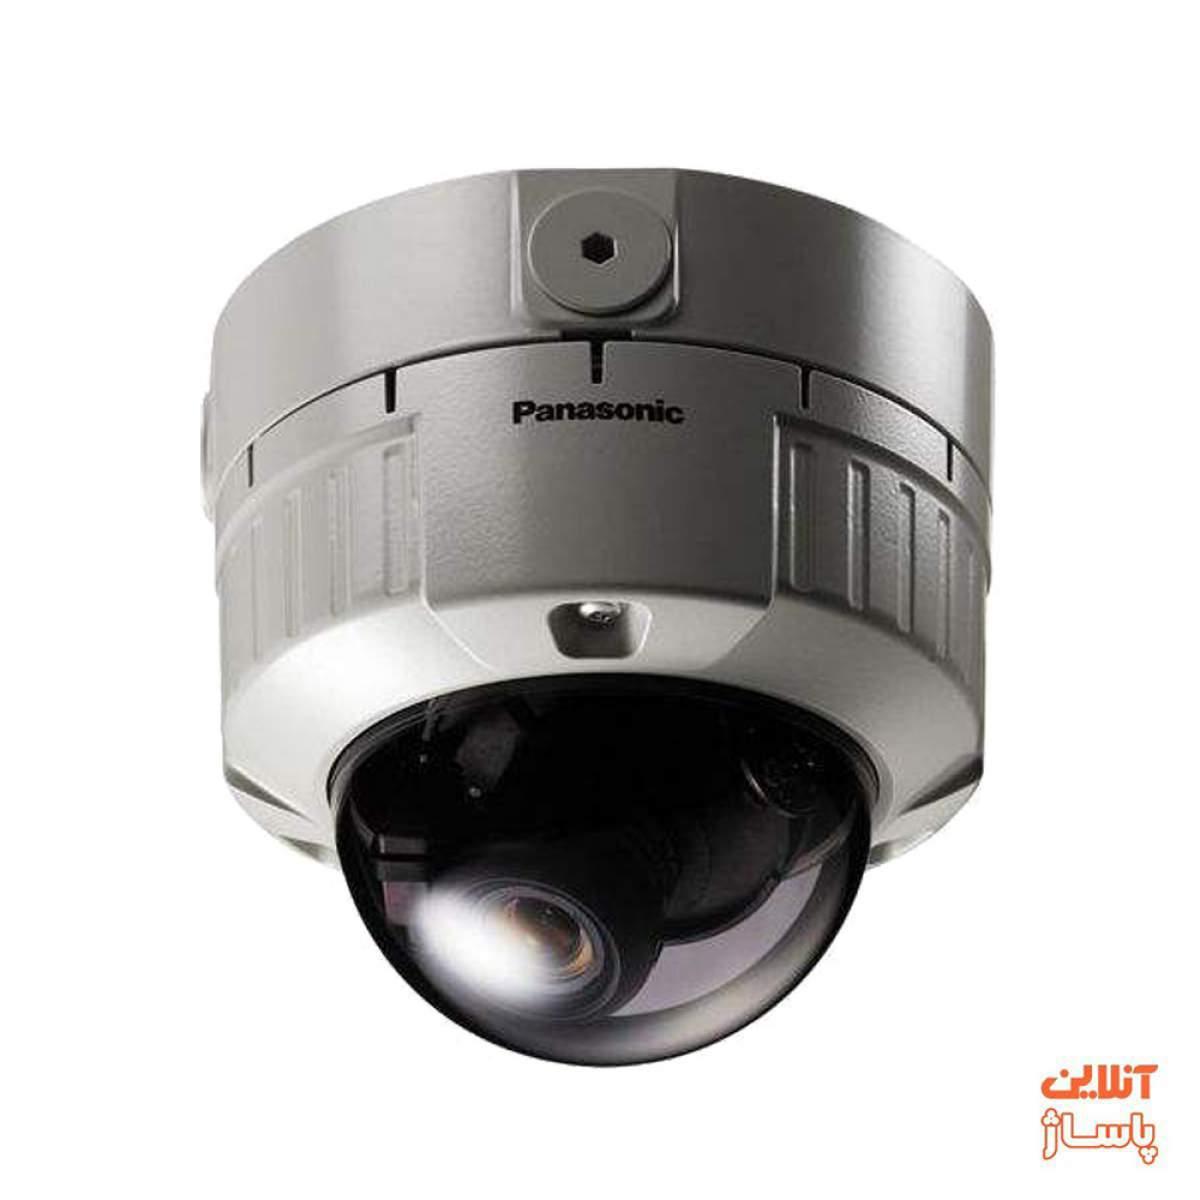 دوربین مداربسته آنالوگ پاناسونیک مدل WV-CW500